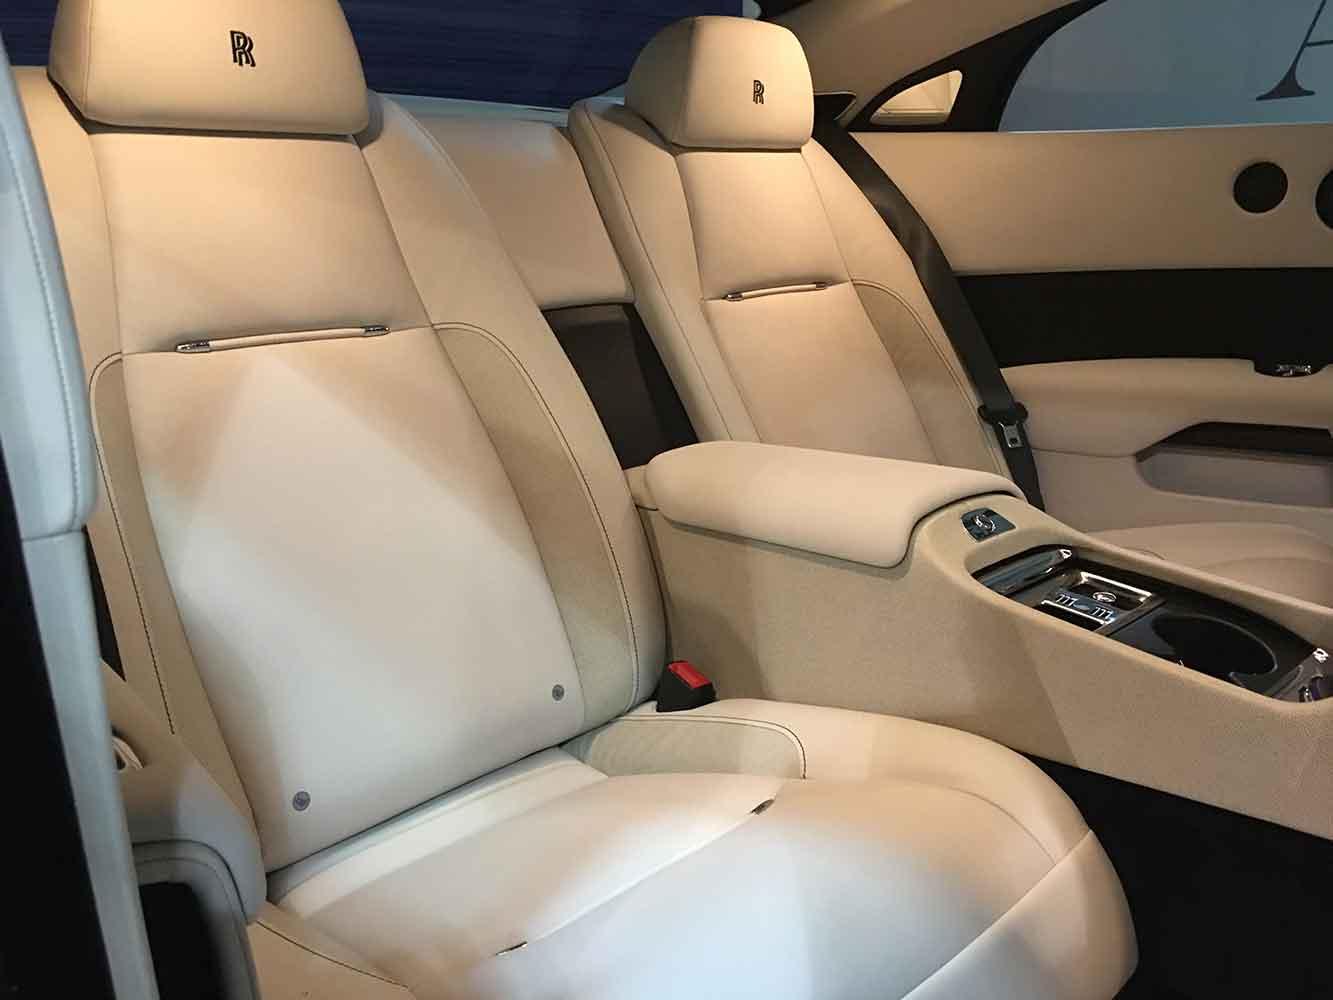 rolls-royce-white-interior